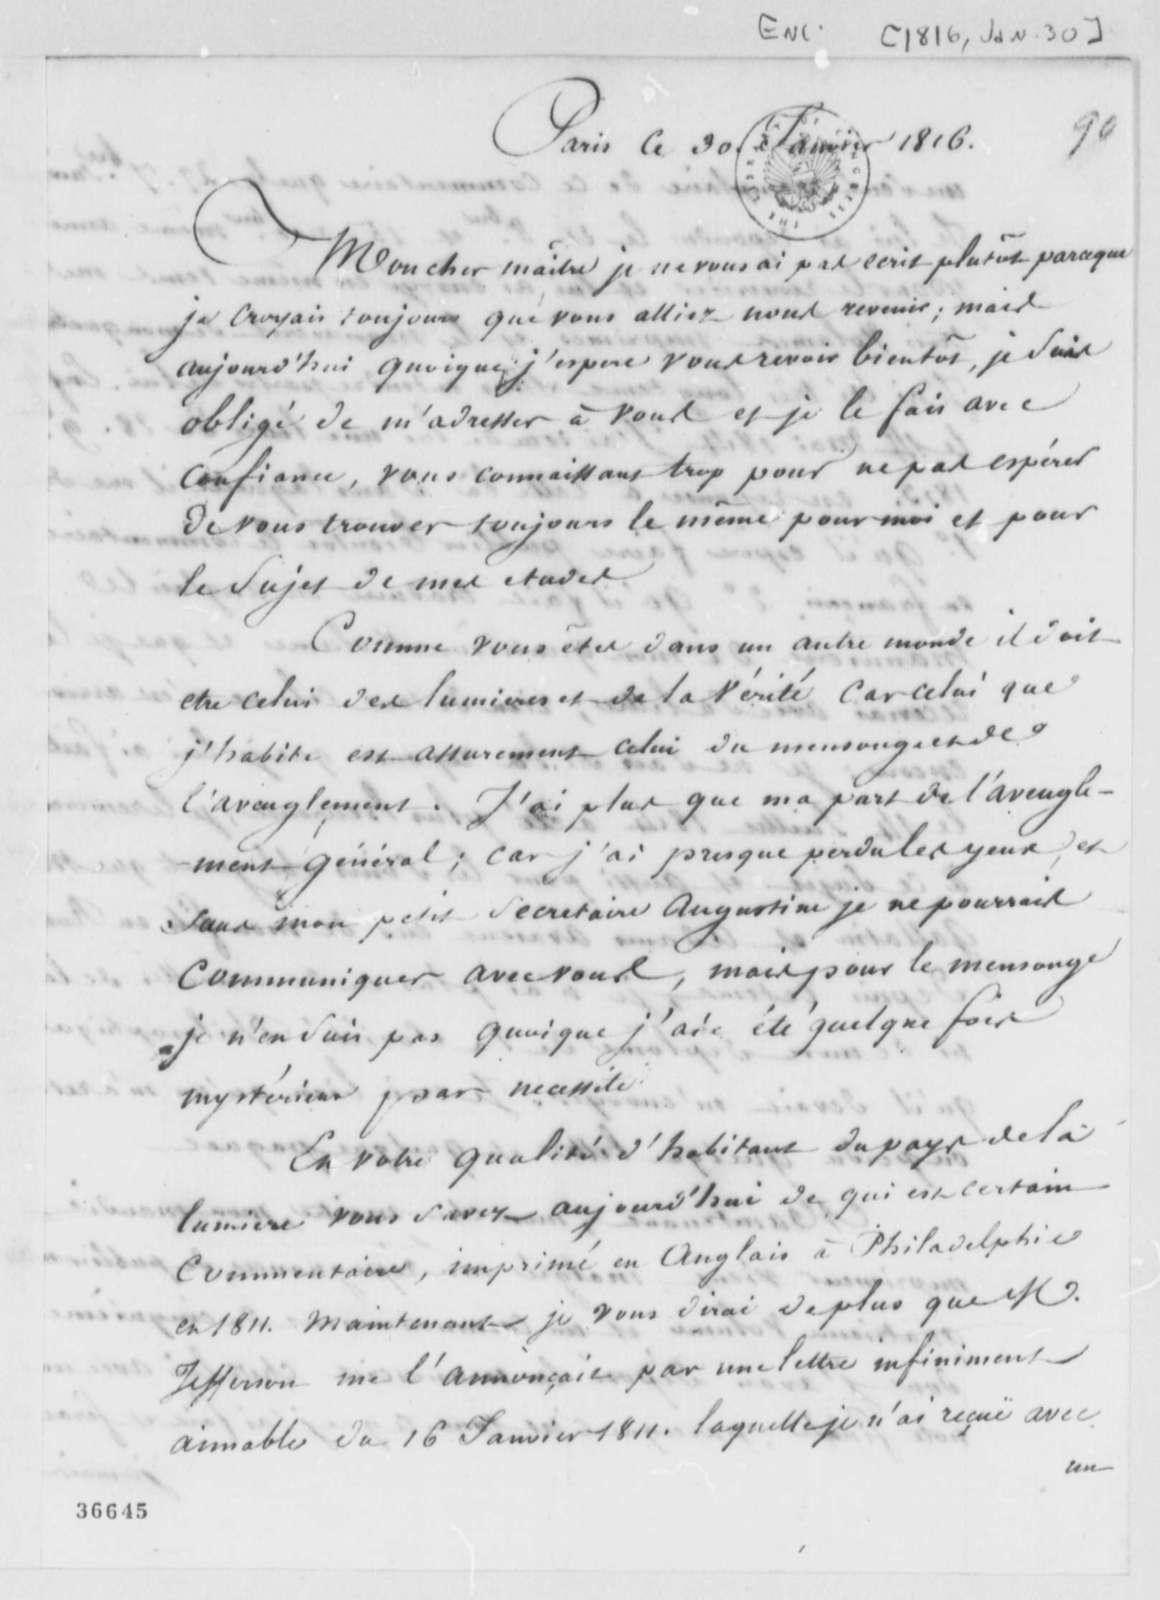 Antoine Louis Claude Destutt de Tracy to Pierre S. Dupont de Nemours, January 30, 1816, in French